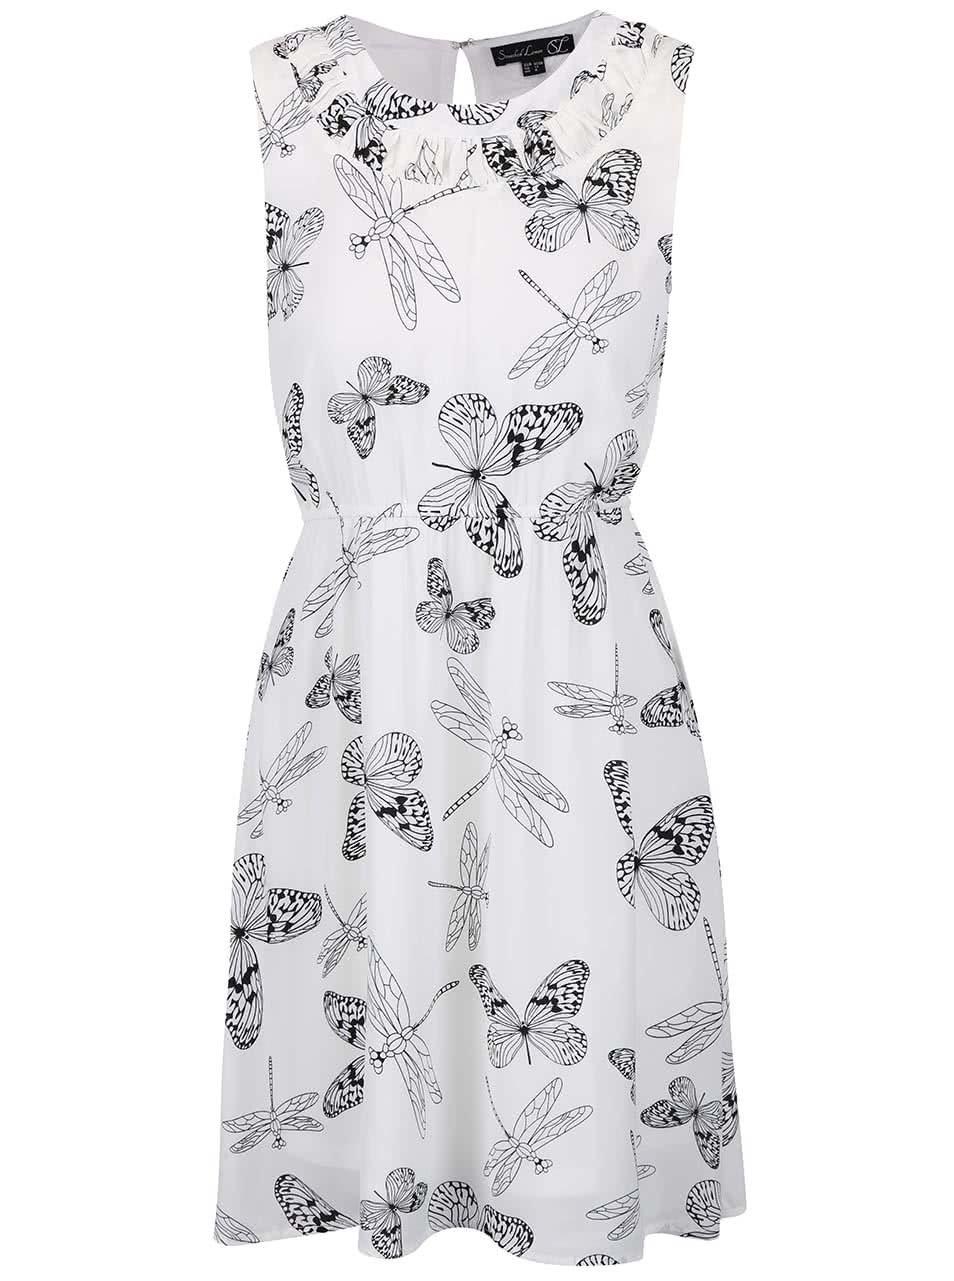 41e85cb71f8c Krémové šaty s čiernou potlačou motýľov Smashed Lemon ...